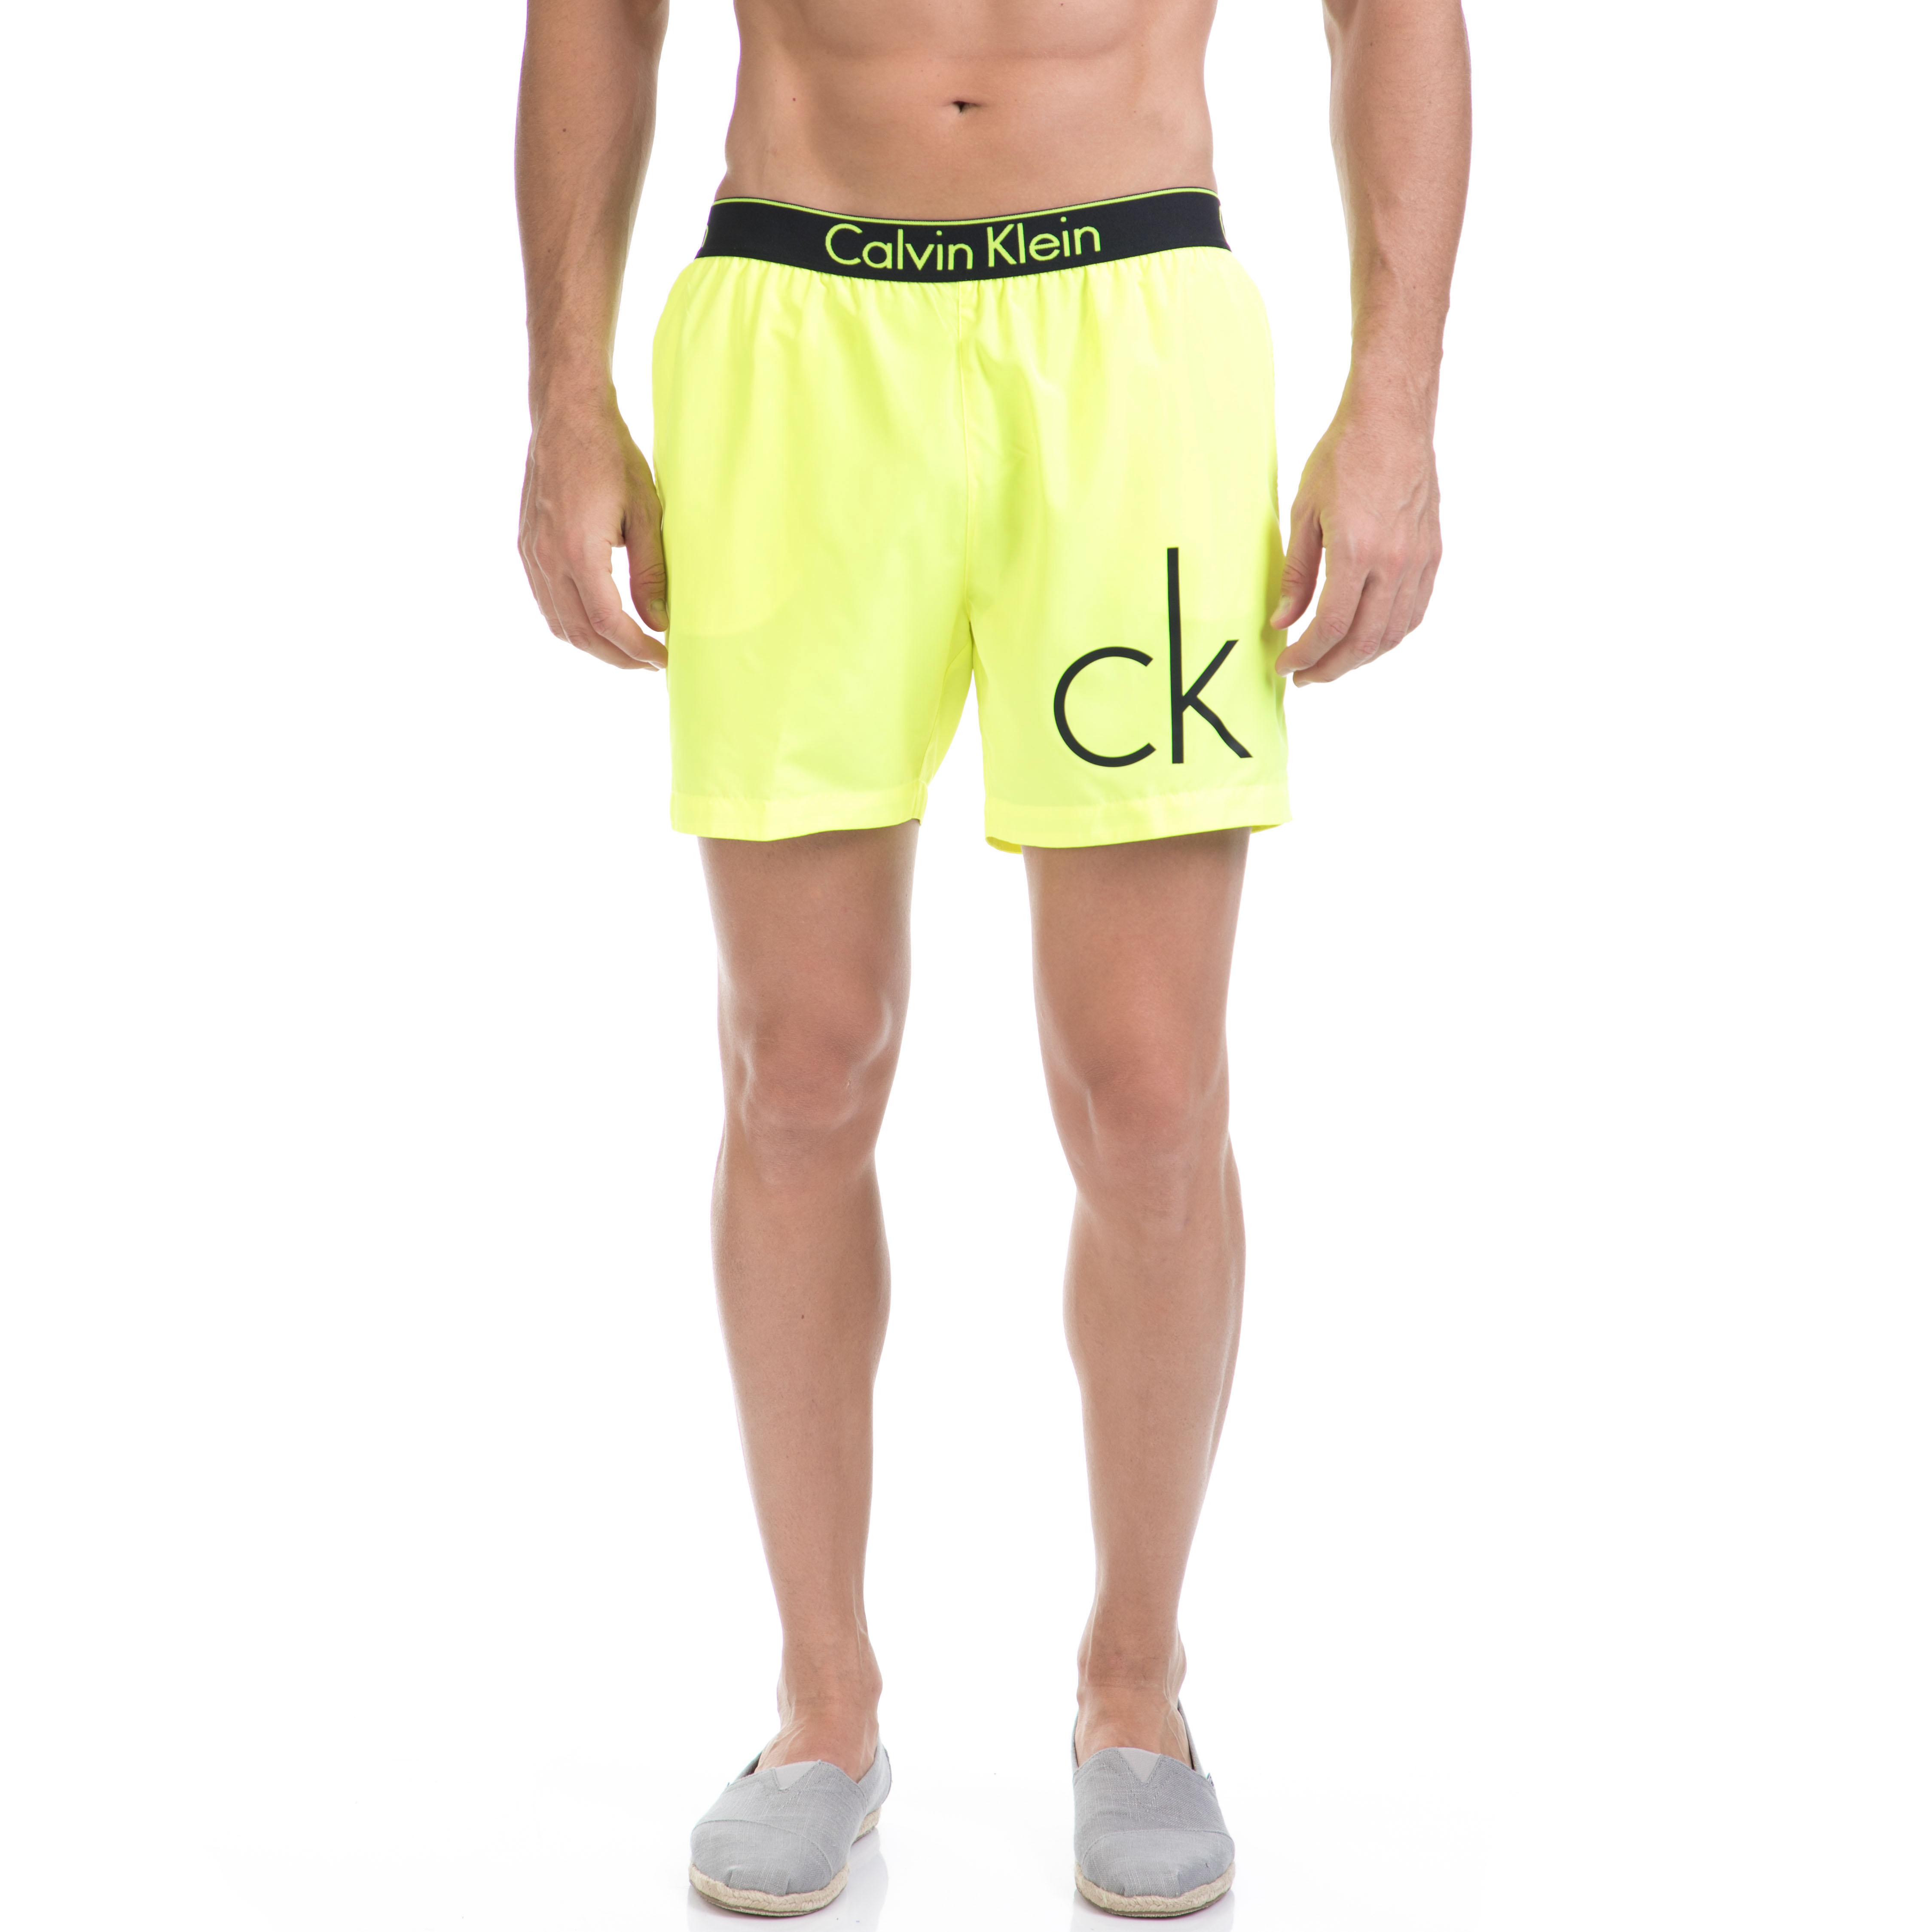 CK UNDERWEAR – Αντρικό μαγιό βερμούδα CK κίτρινο